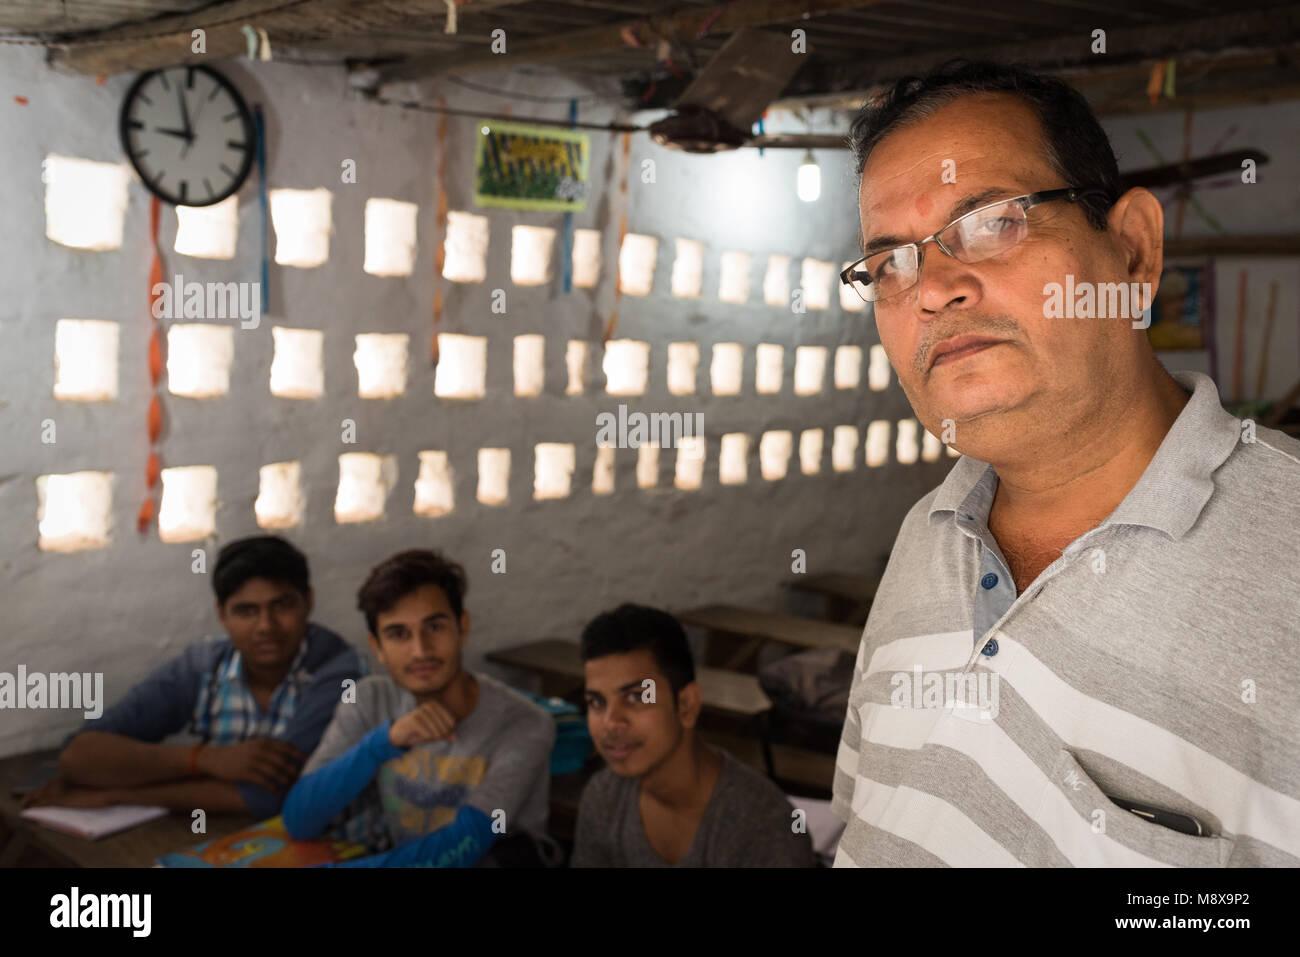 Hajipur Stock Photos & Hajipur Stock Images - Alamy